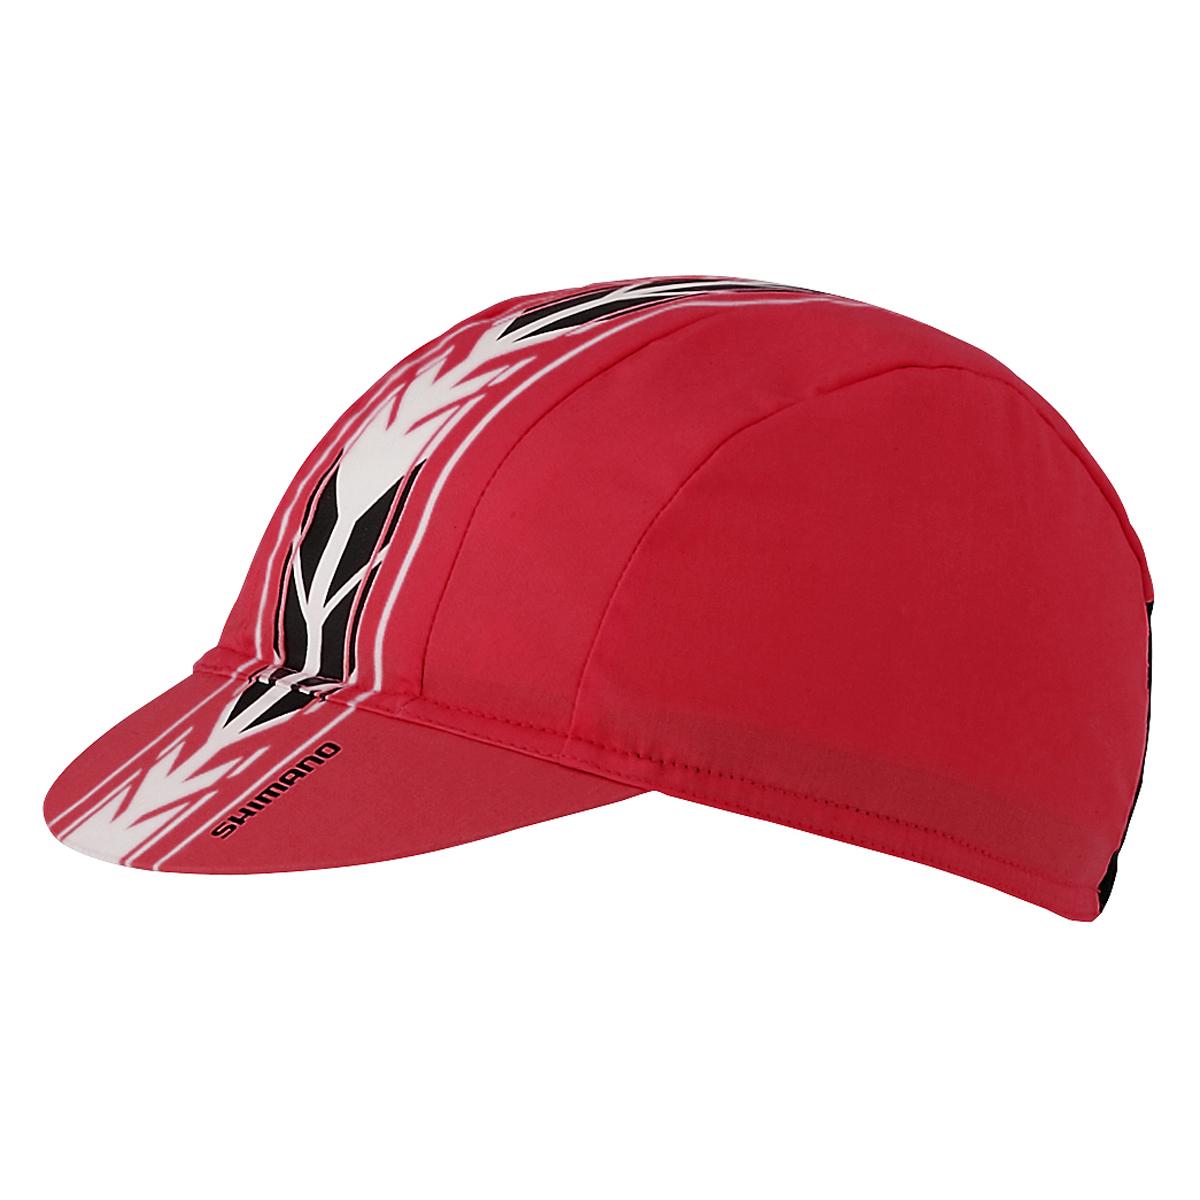 Shimano Czapka kolarska Racing kolor czerwony one size